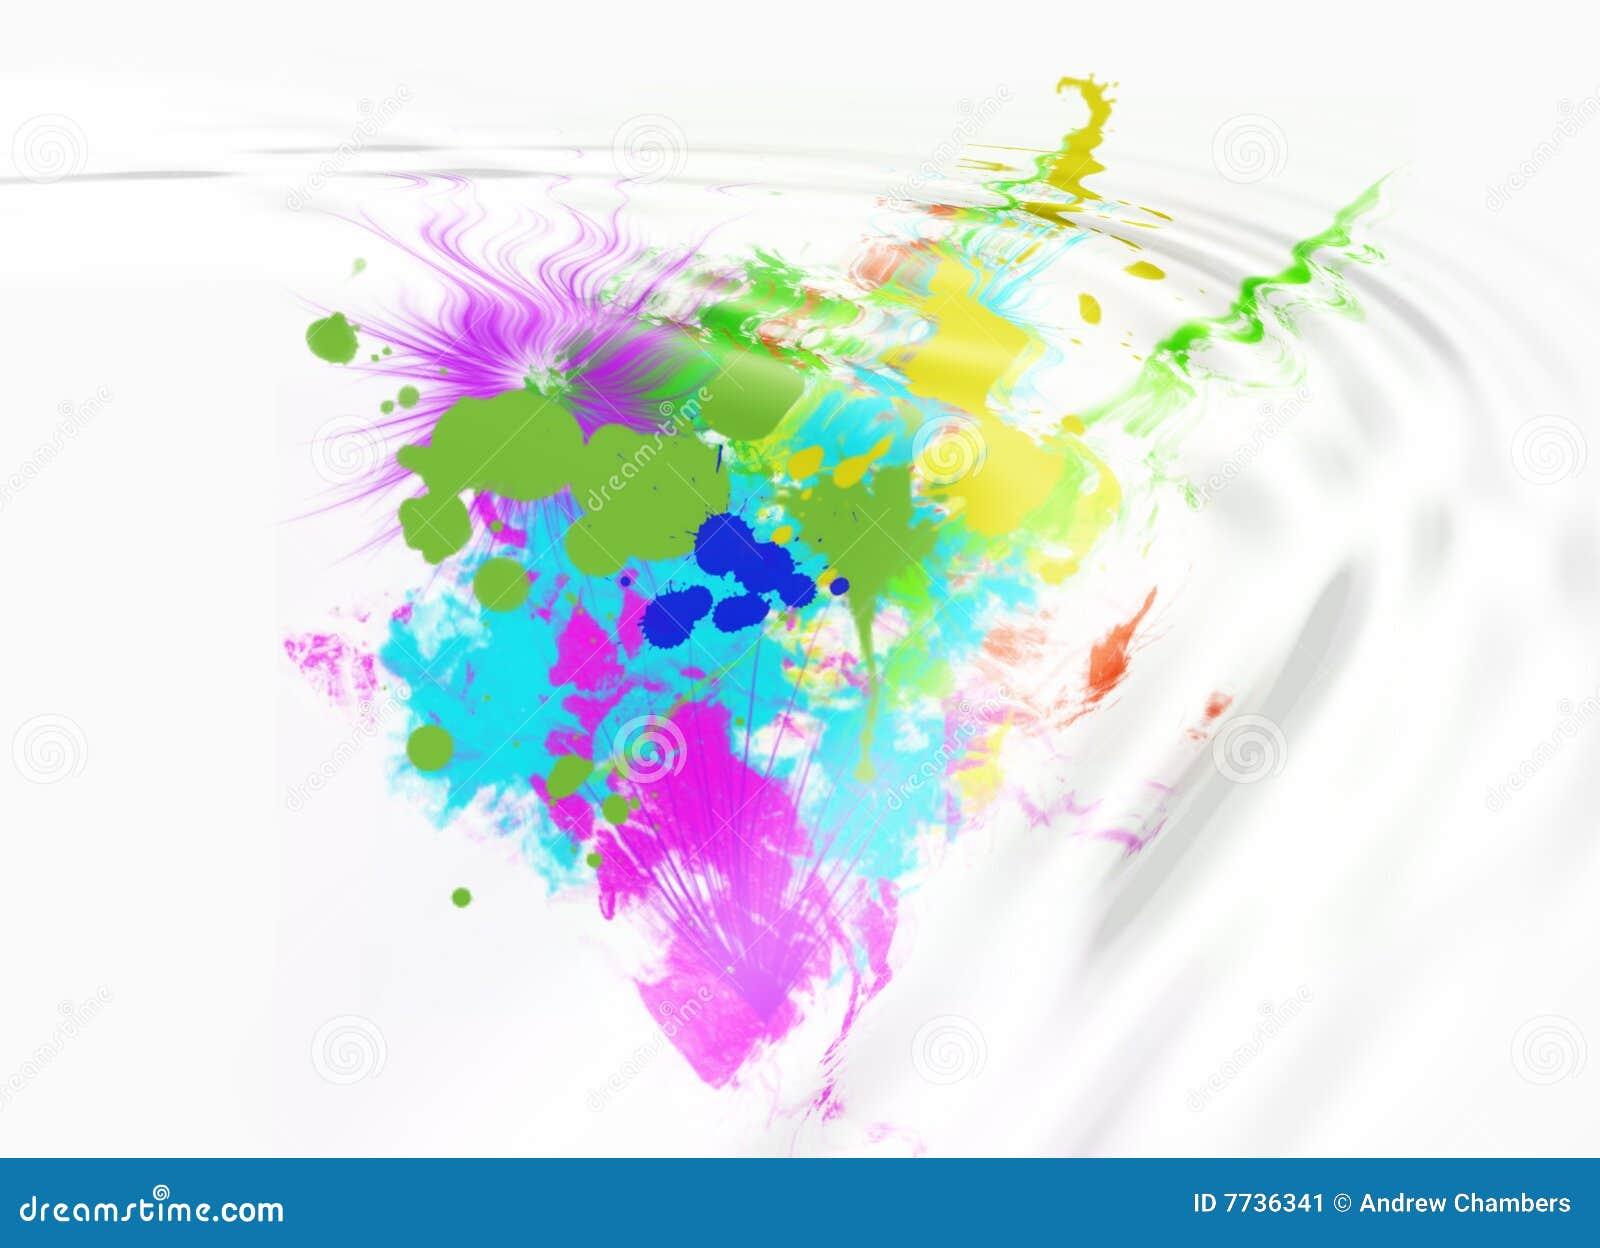 Barwioni abstraktów splotches